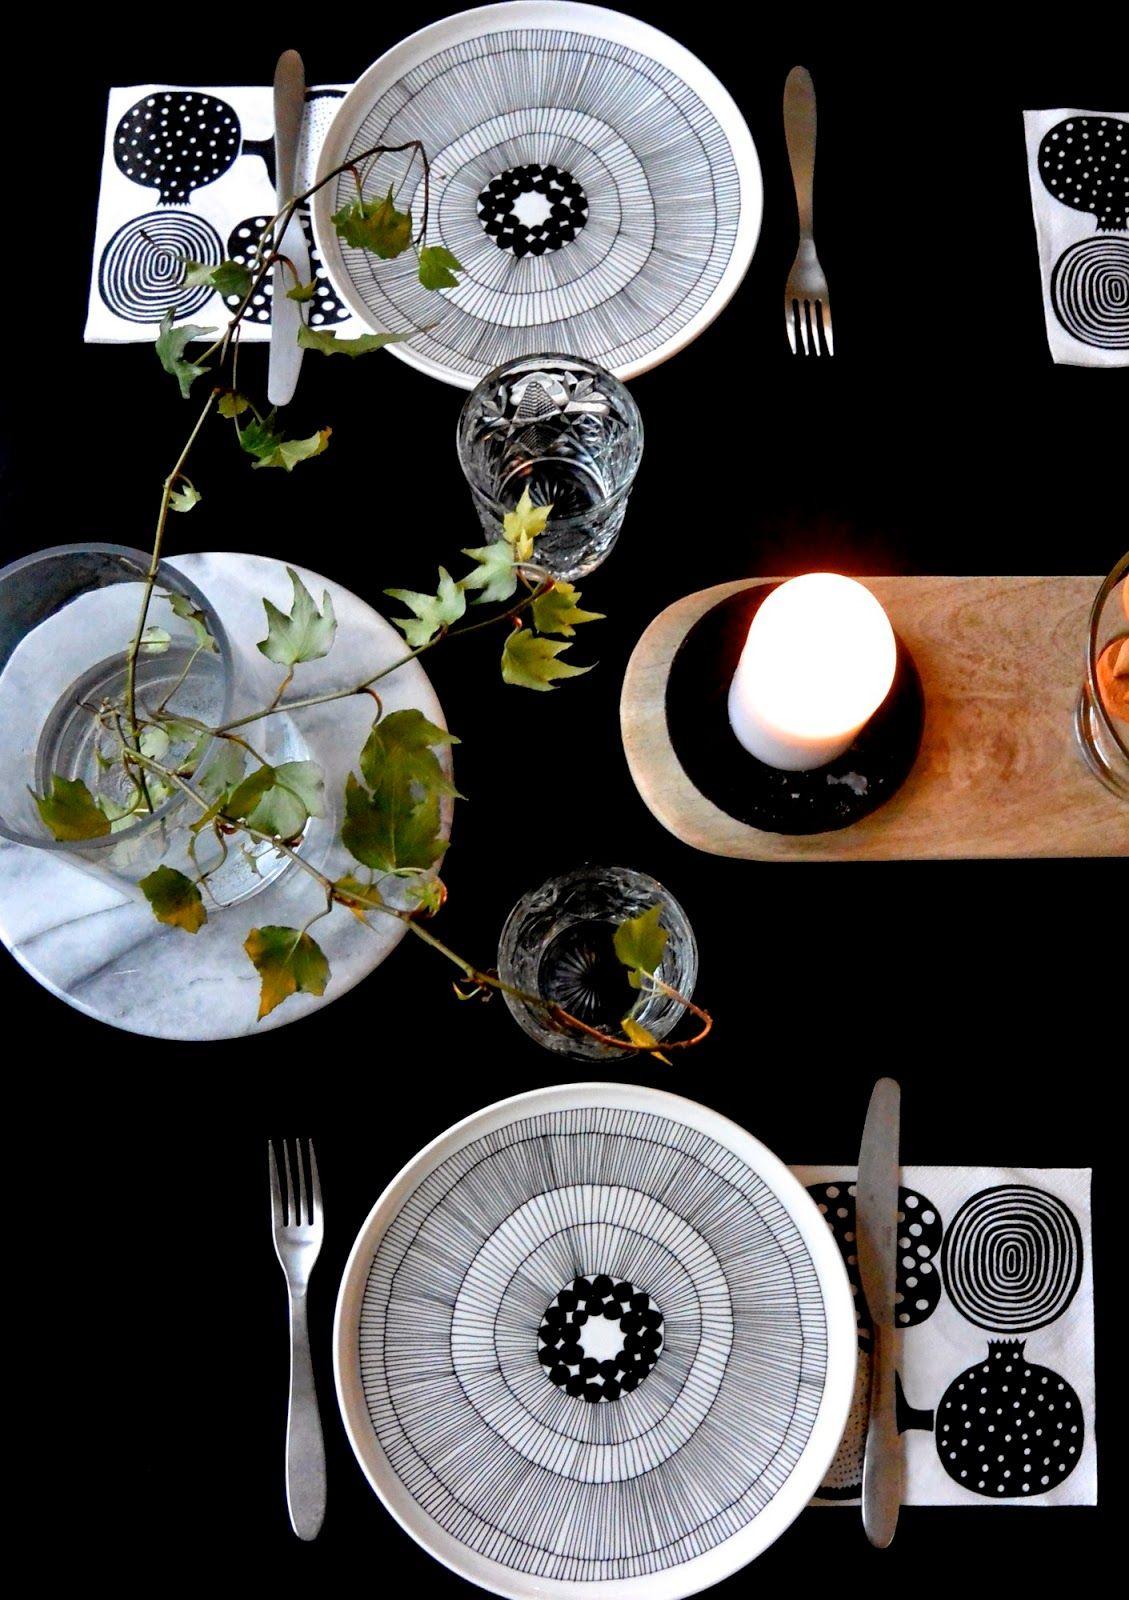 marimekko home s s 2016 available at santina 39 s both stores penshurst leichhardt www. Black Bedroom Furniture Sets. Home Design Ideas